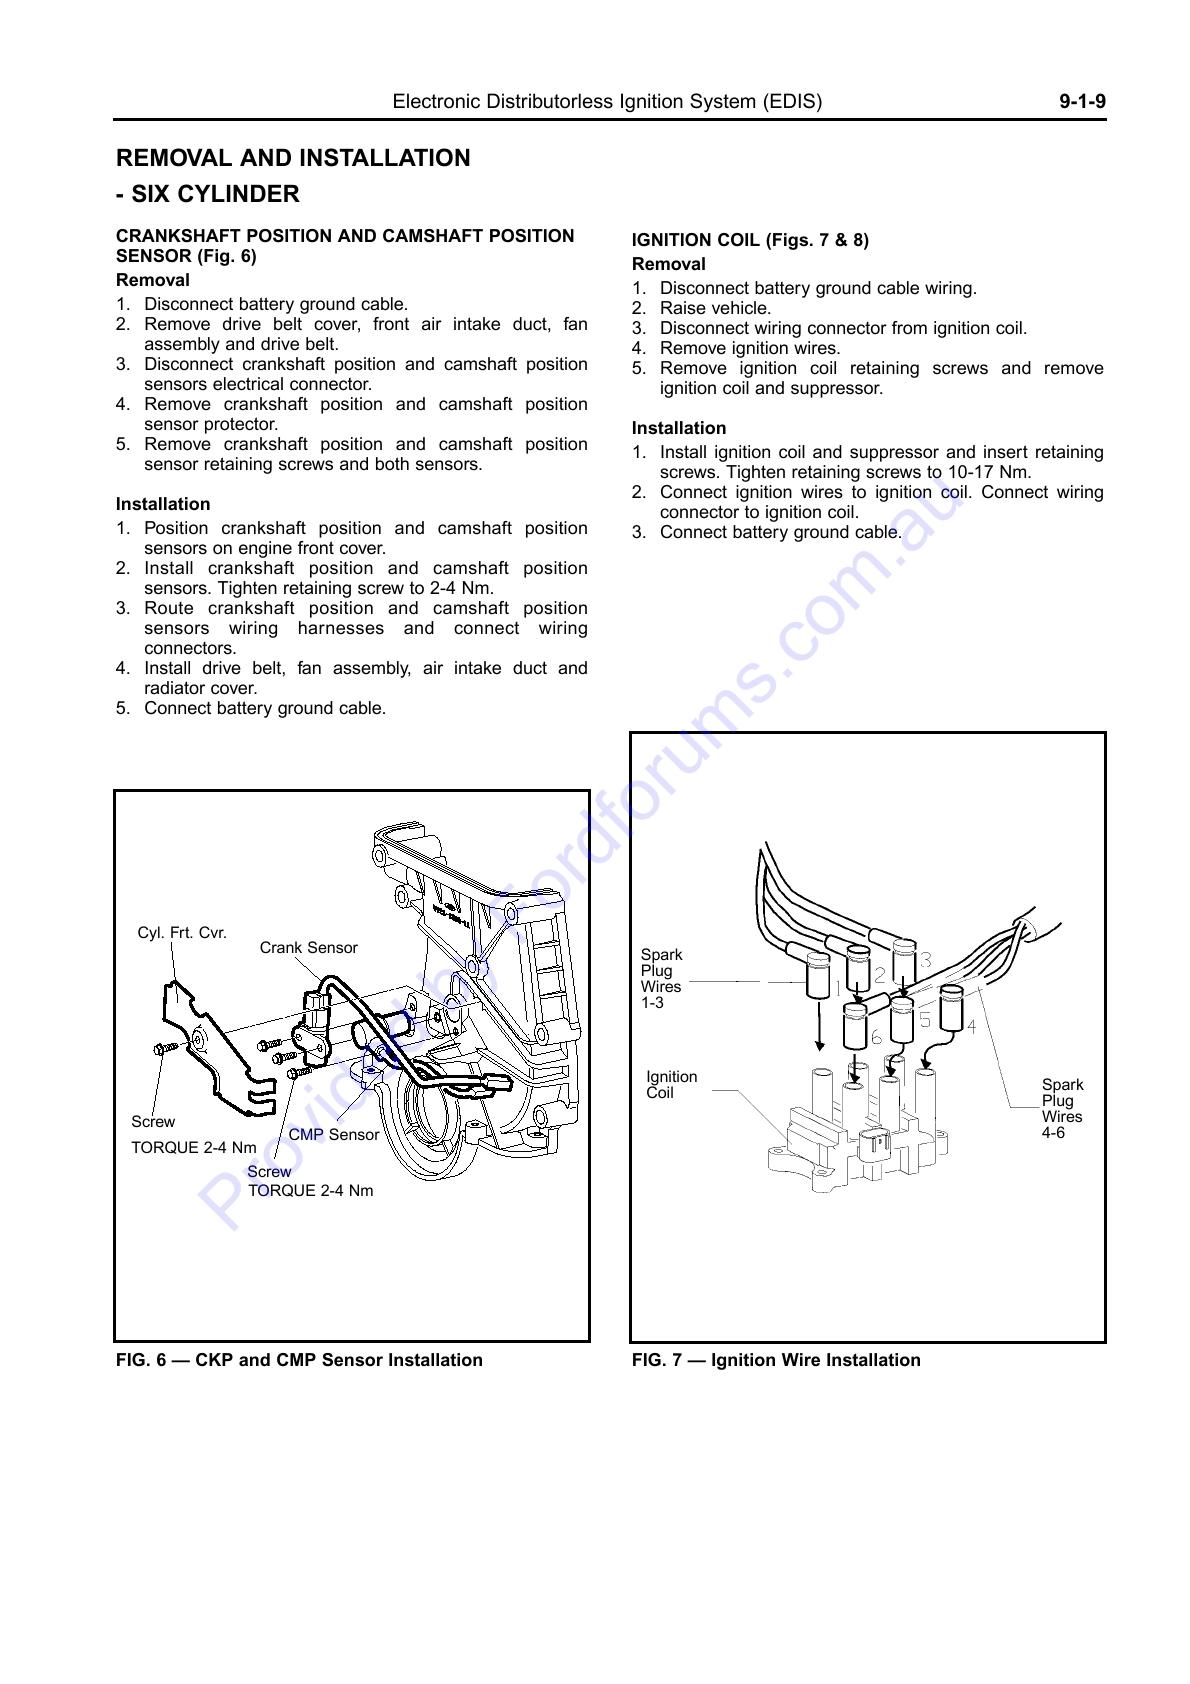 Electronic Distributorless Ignition System (EDIS)